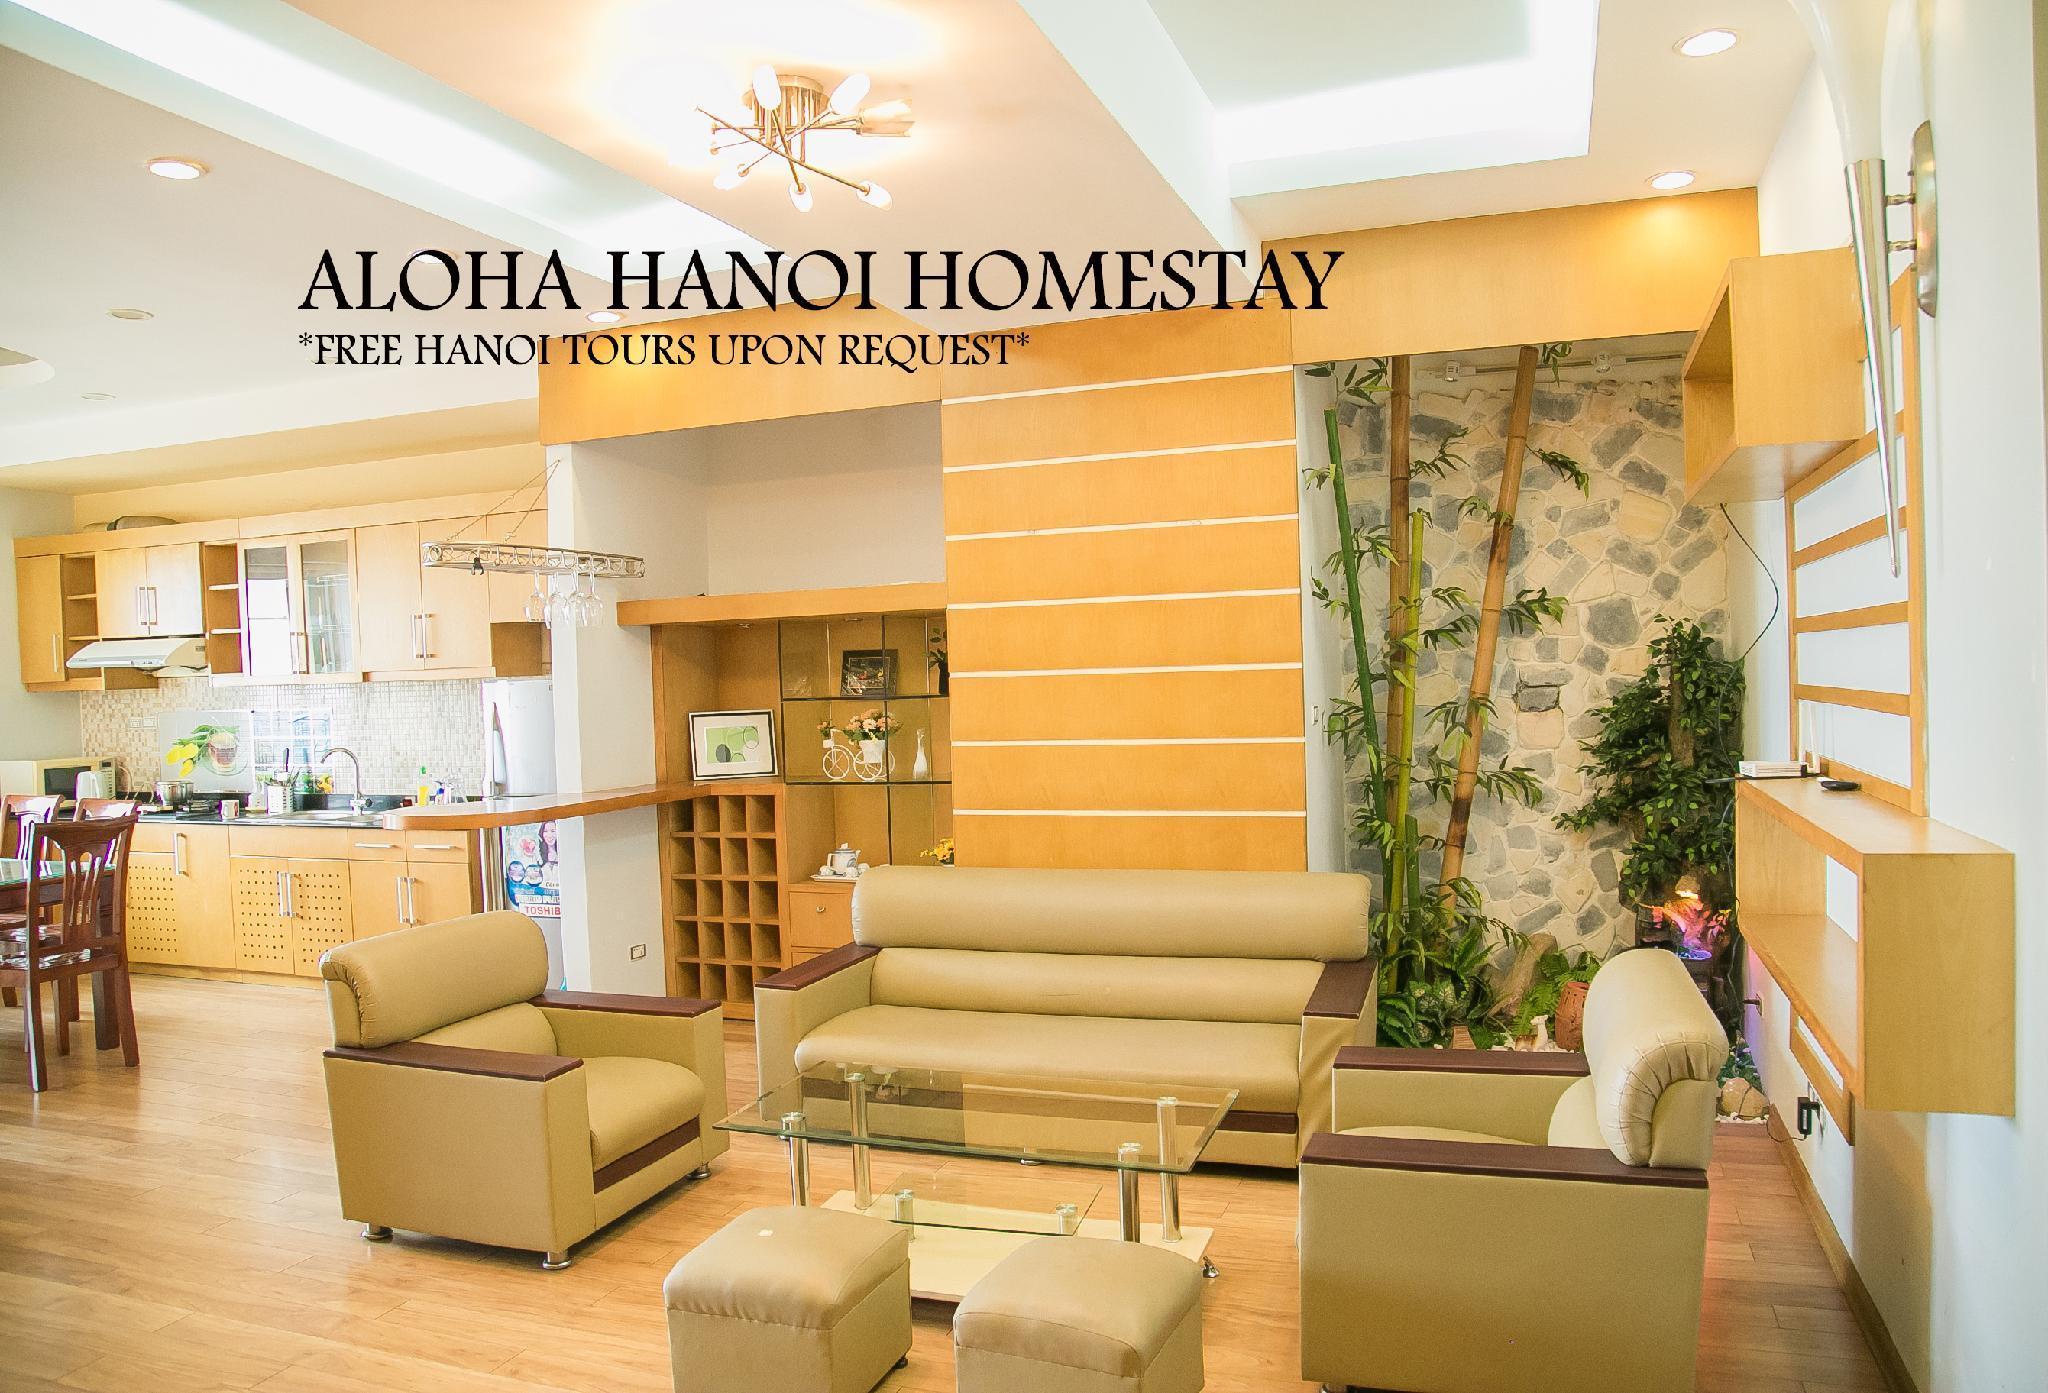 Aloha Hanoi Homestay 12A